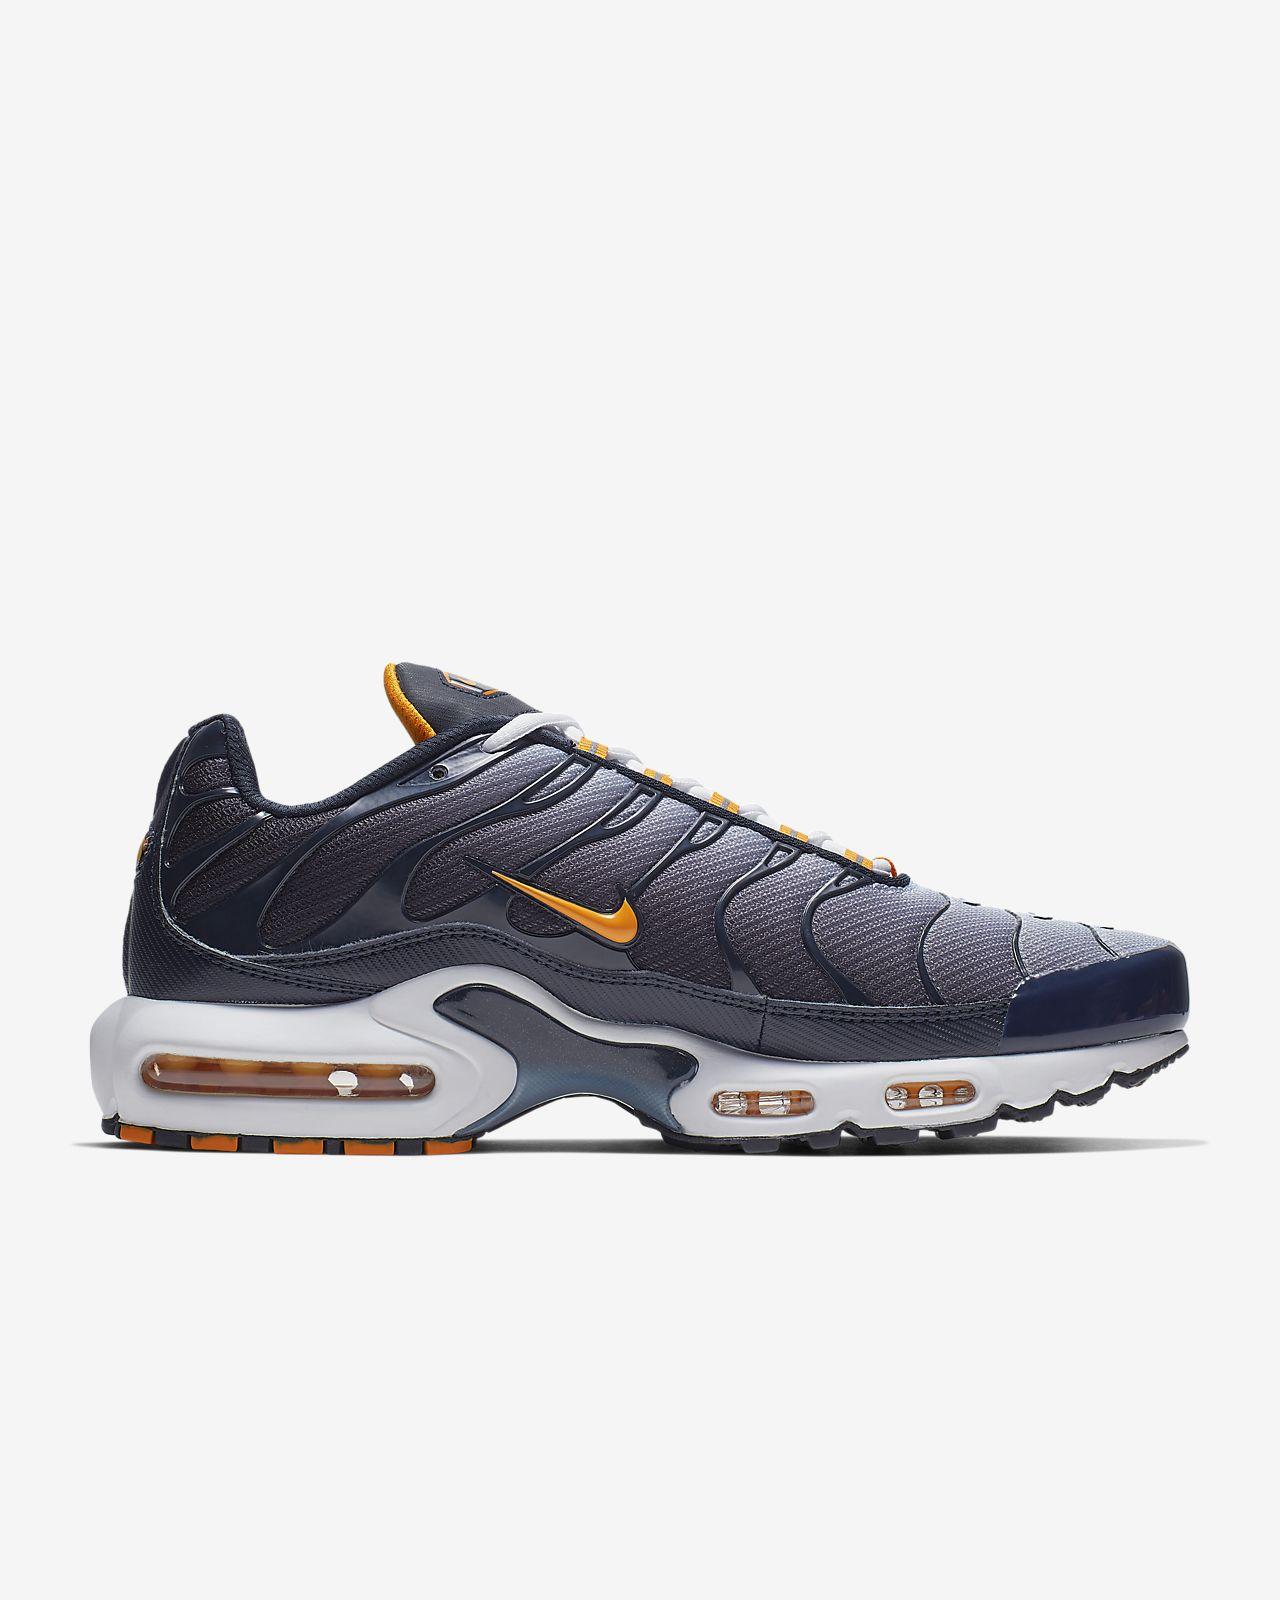 wholesale dealer 0b4b4 8e05a ... Chaussure Nike Air Max Plus pour Homme